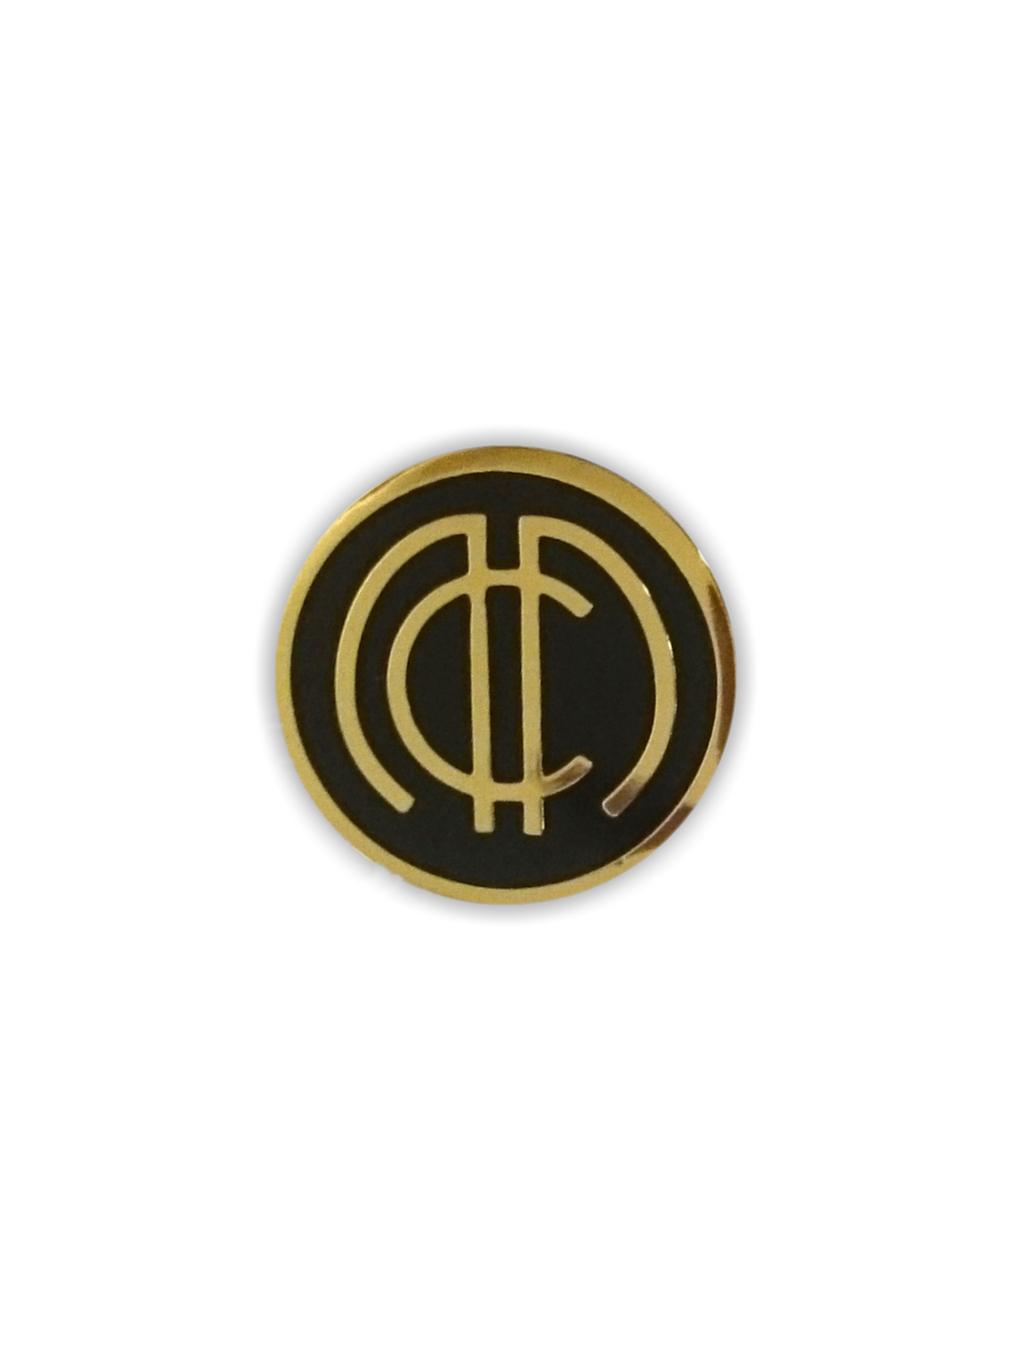 Значок эмблема ОЛЛС фото